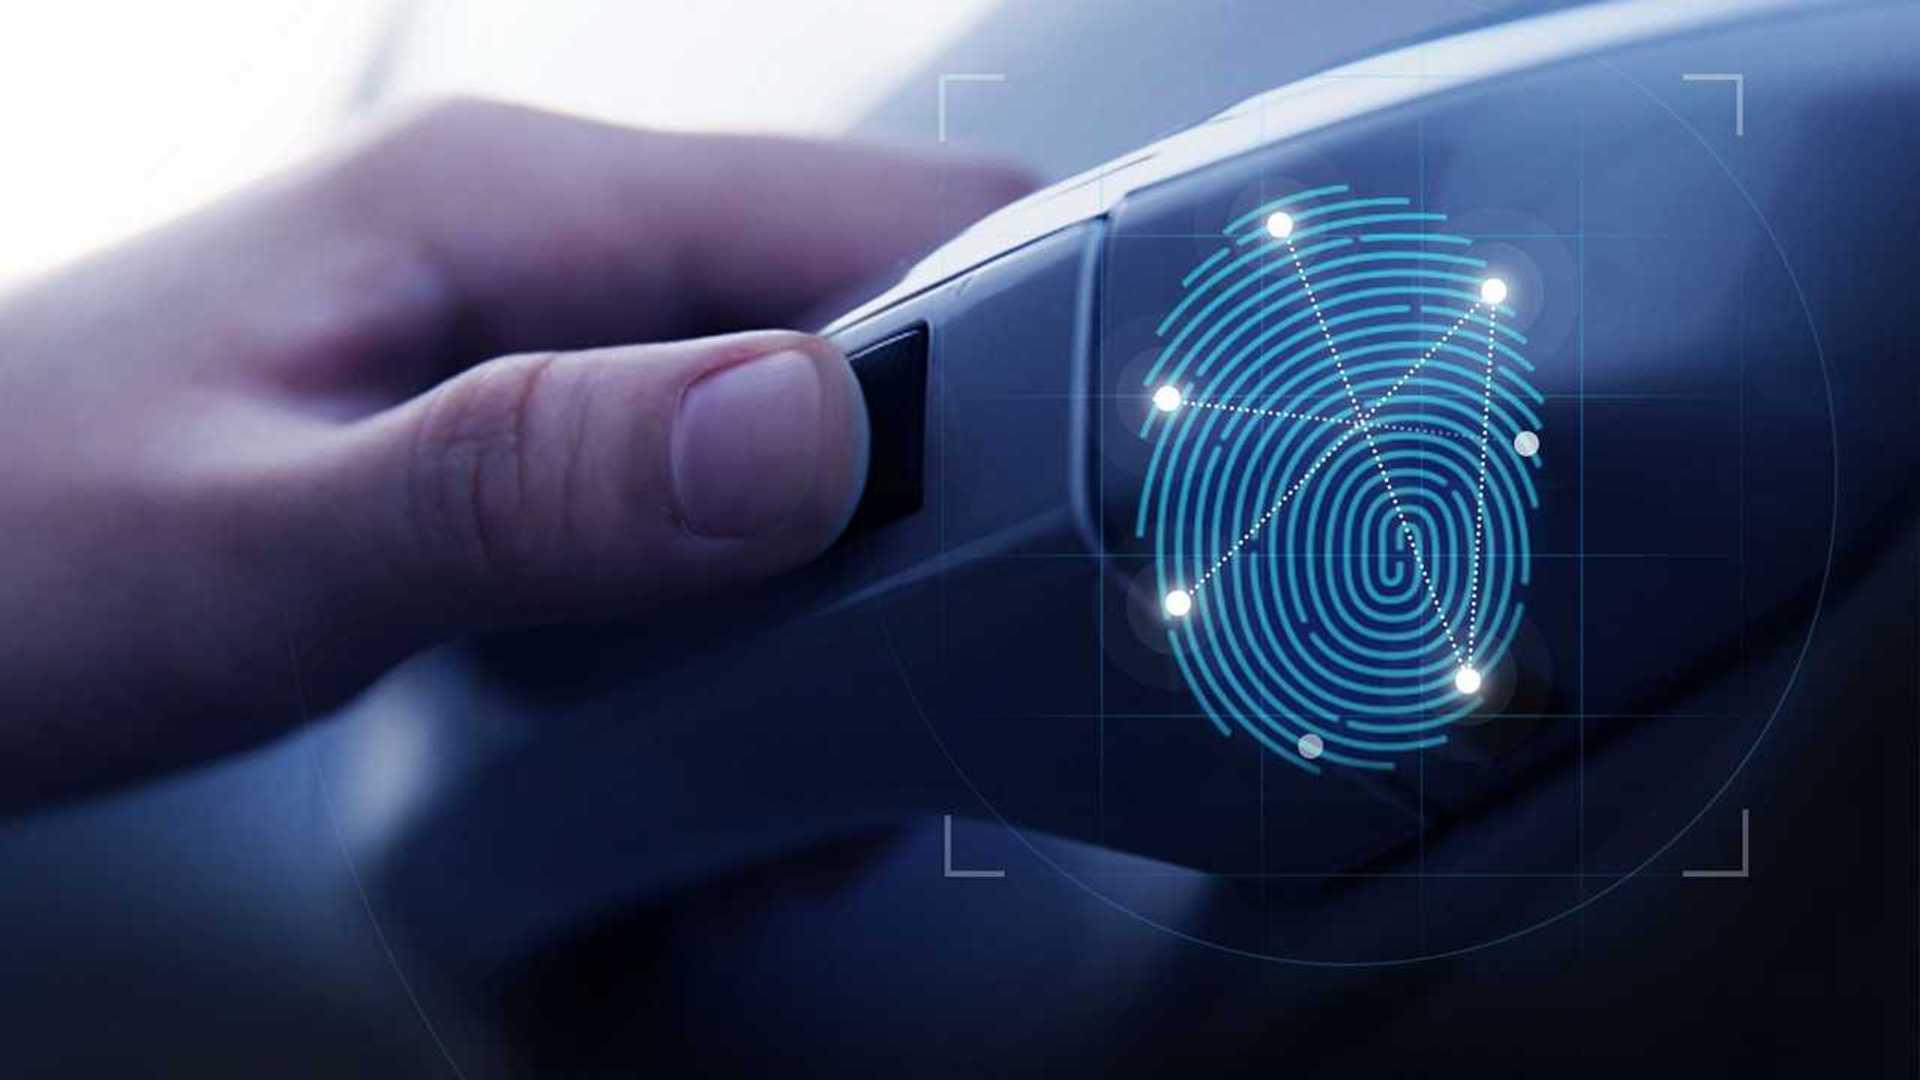 2019-hyundai-santa-fe-fingerprint-recogn